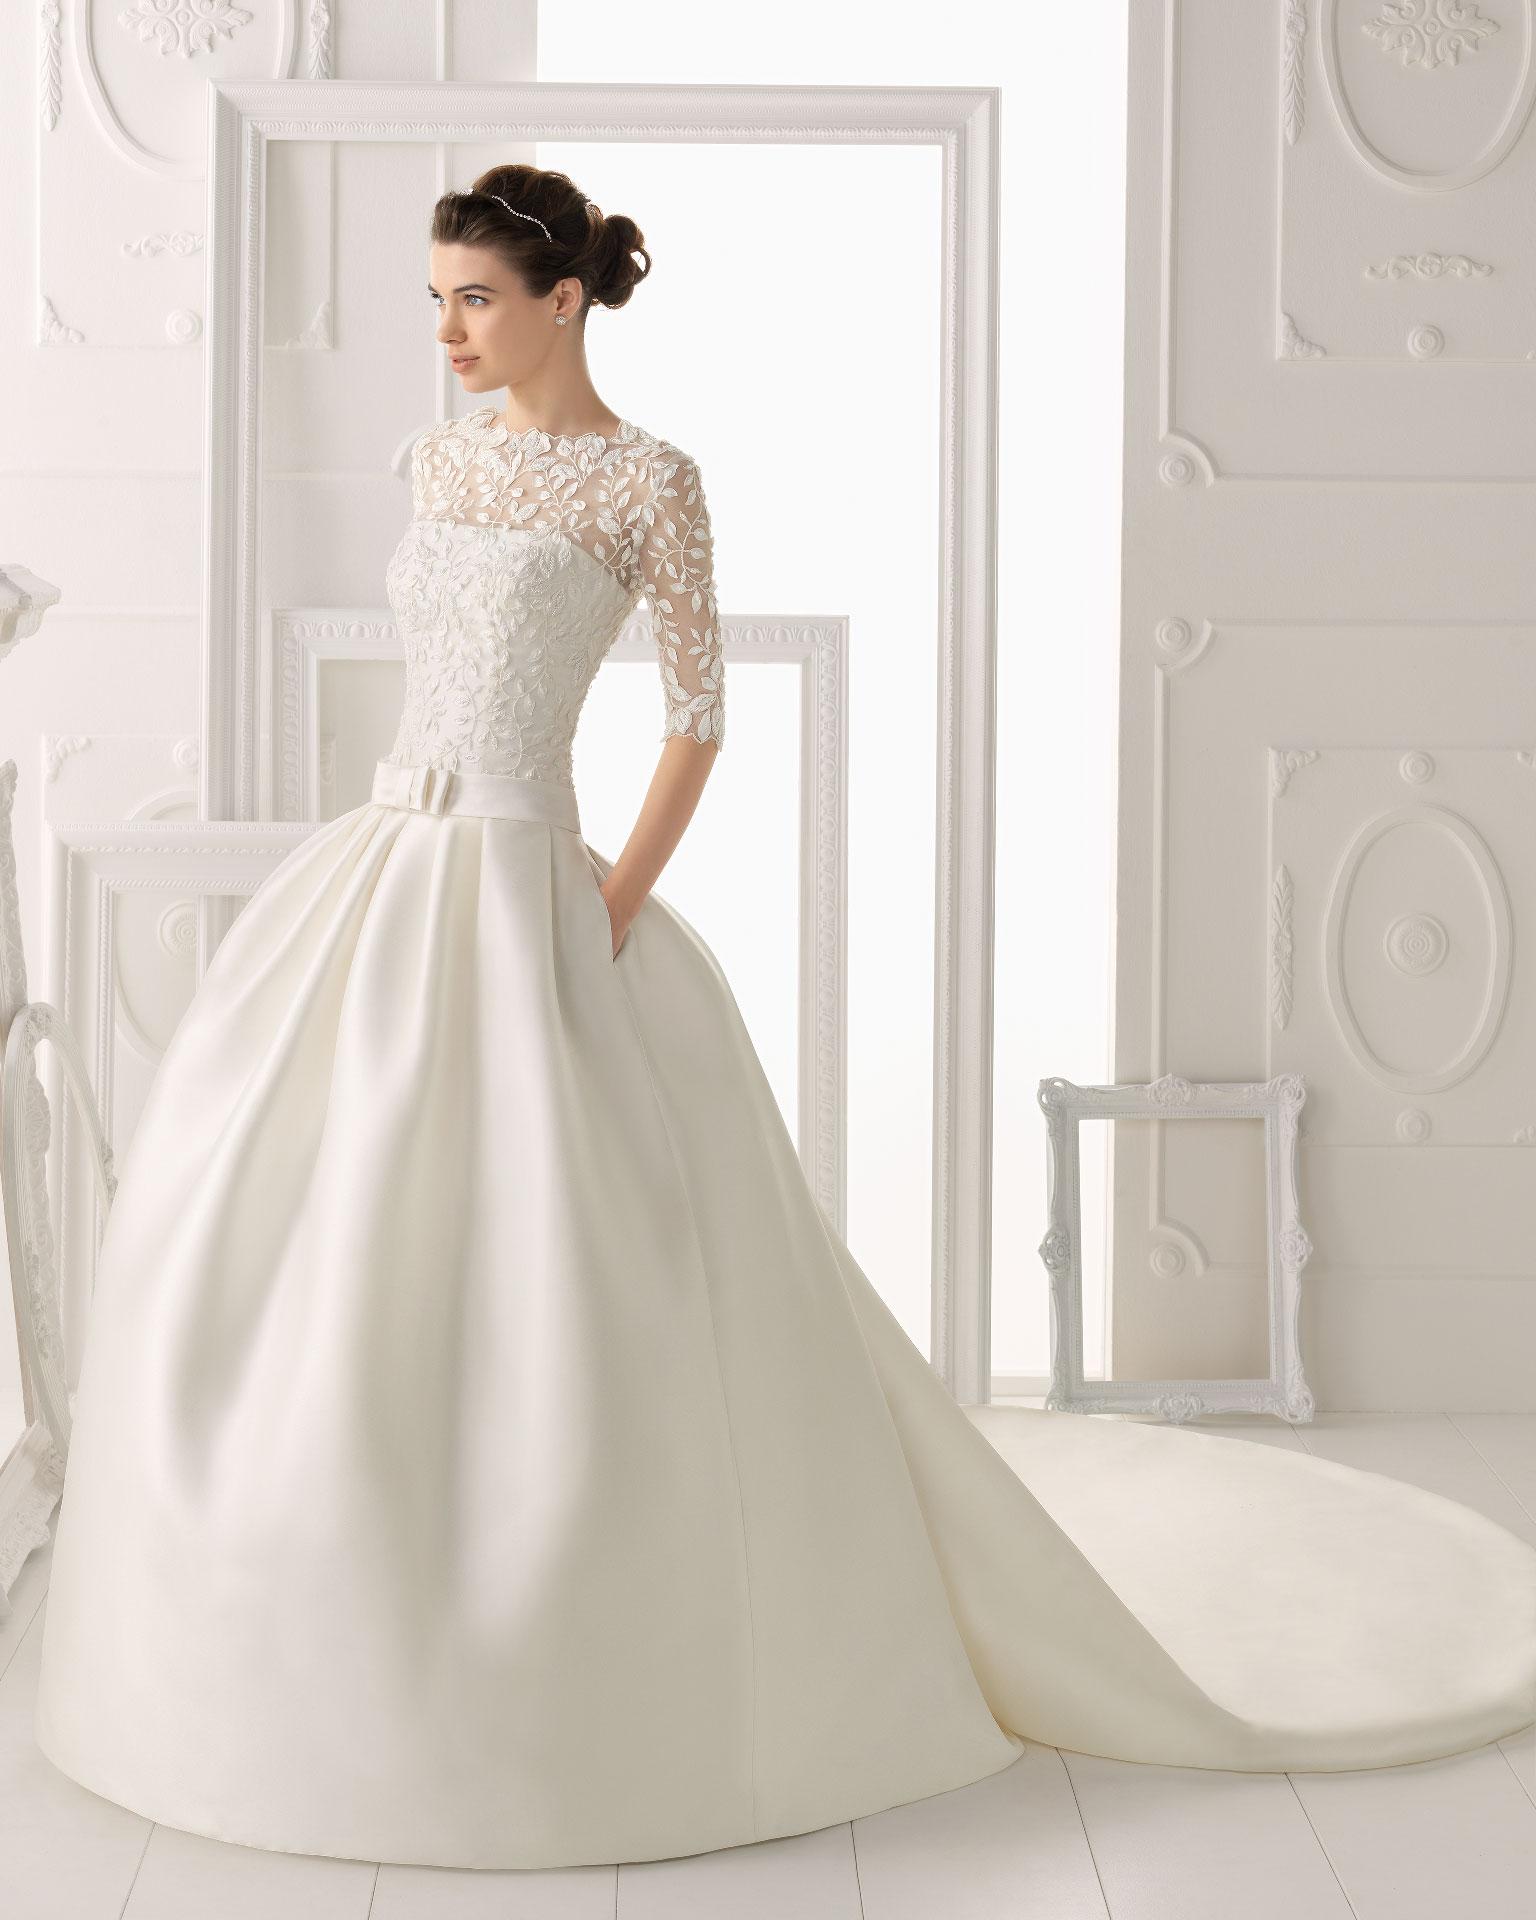 Aire barcelona wedding dress 2014 bridal orozco for Wedding dresses in barcelona spain